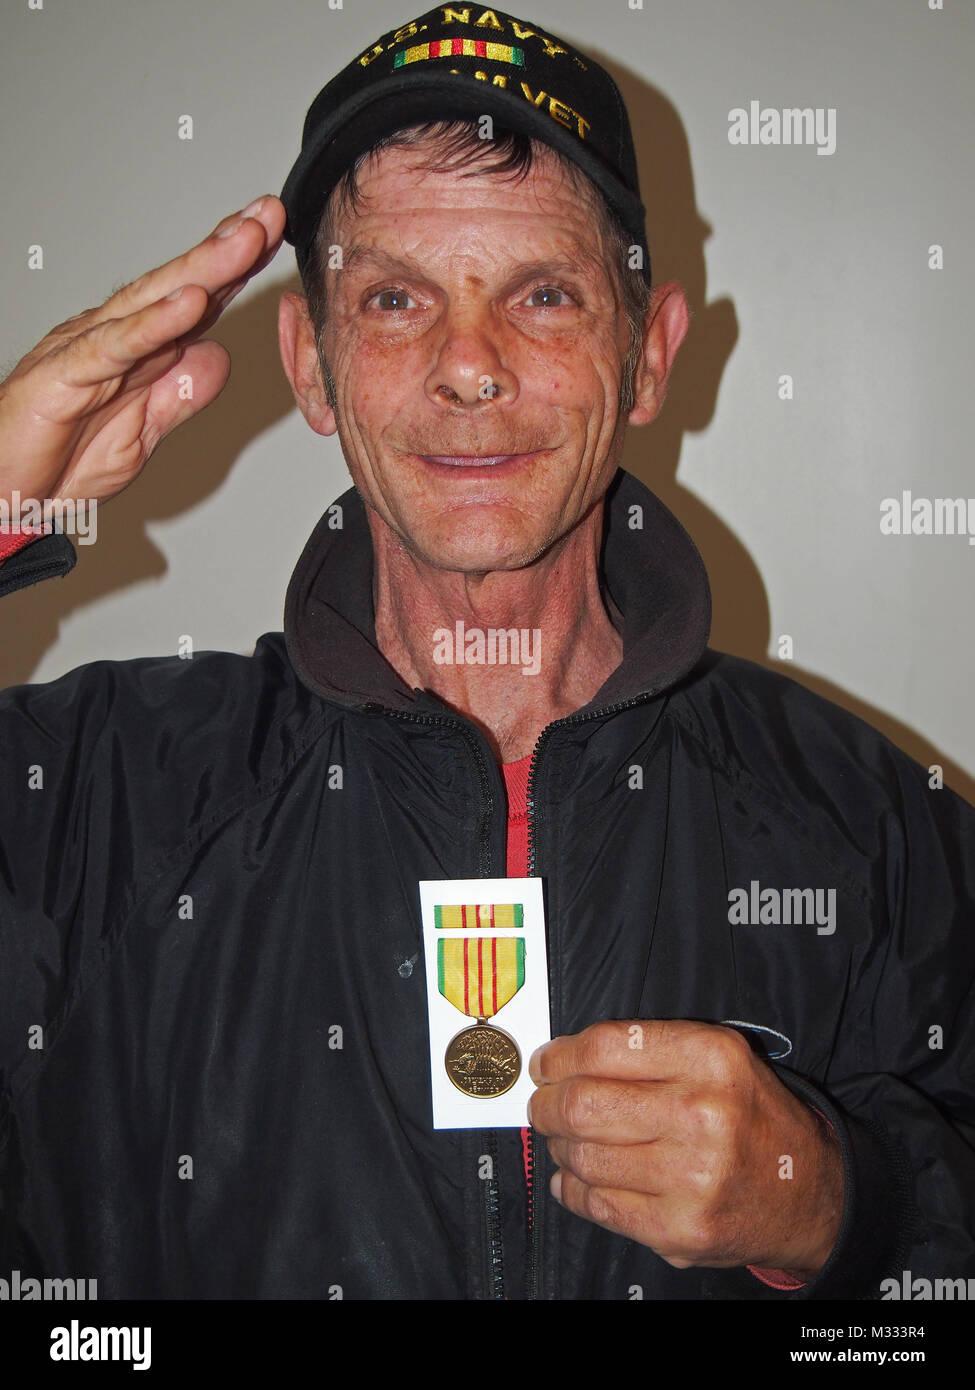 US Navy Vietnam War veteran with Vietnam Service medal - Stock Image